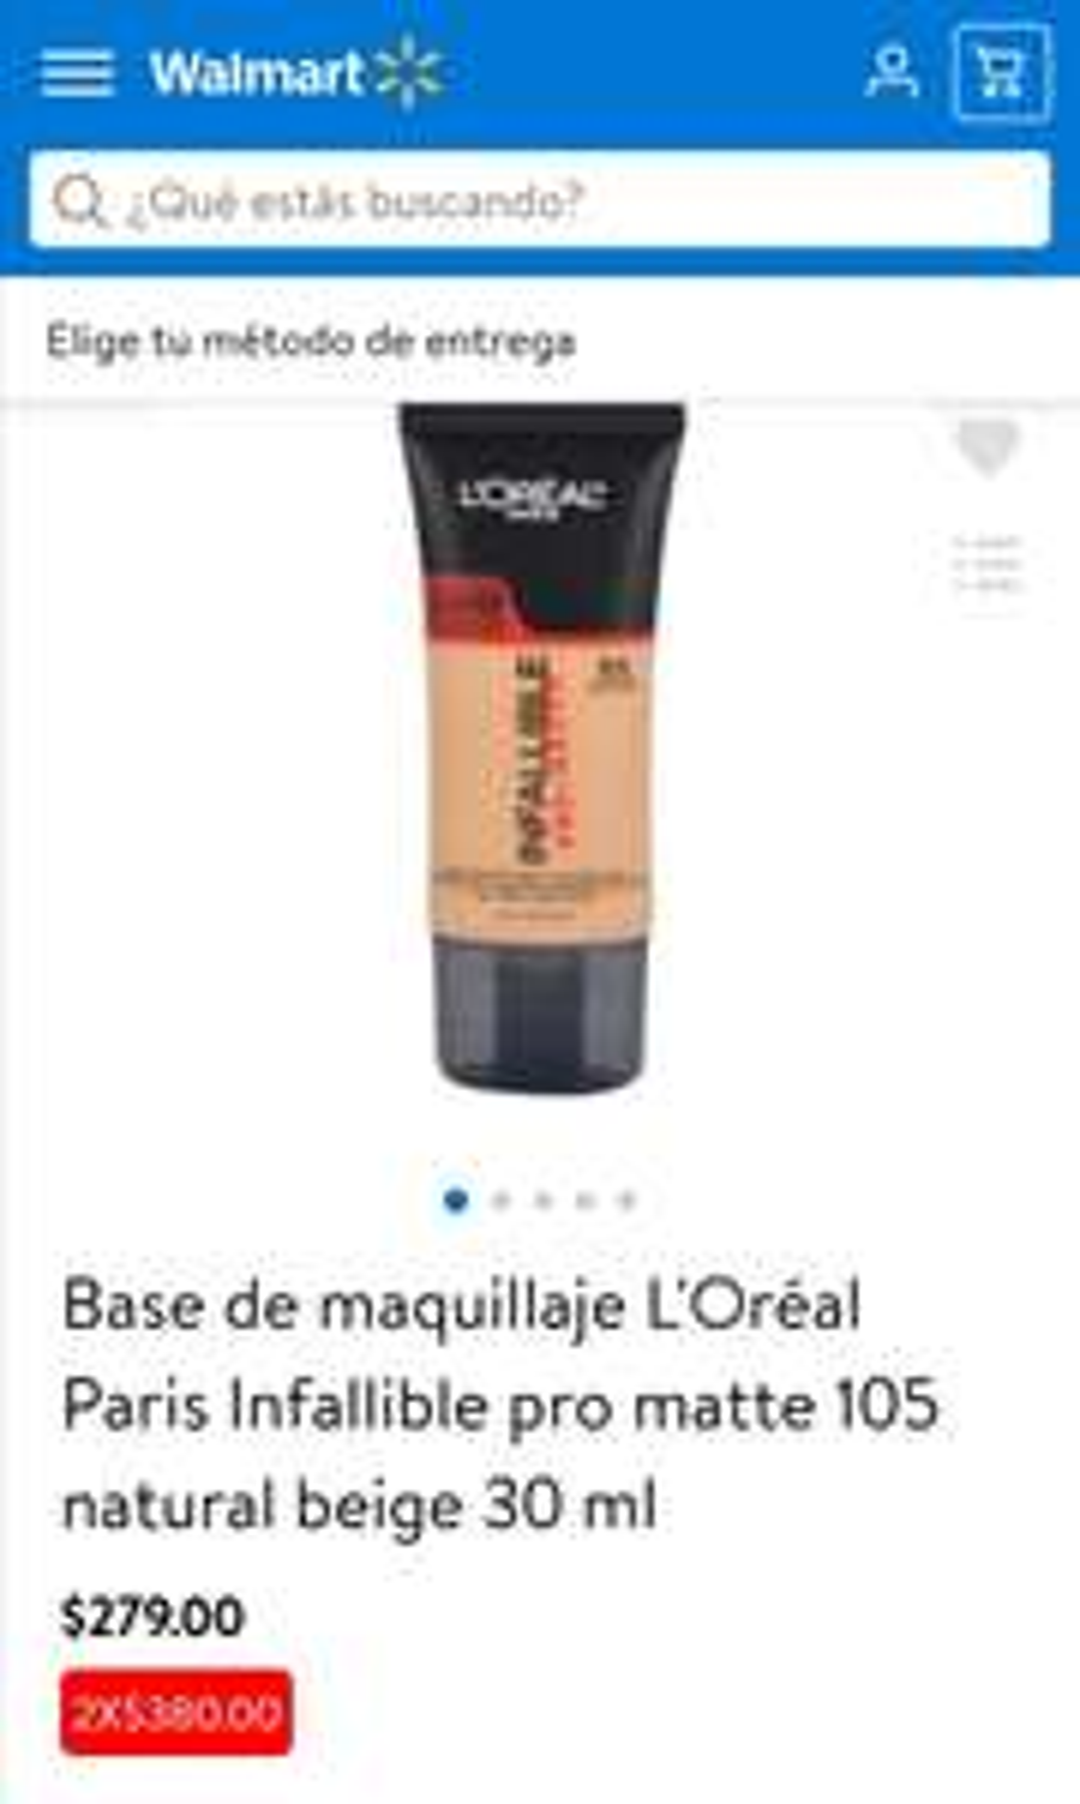 Walmart: Base de maquillaje L'Oréal 2X$380